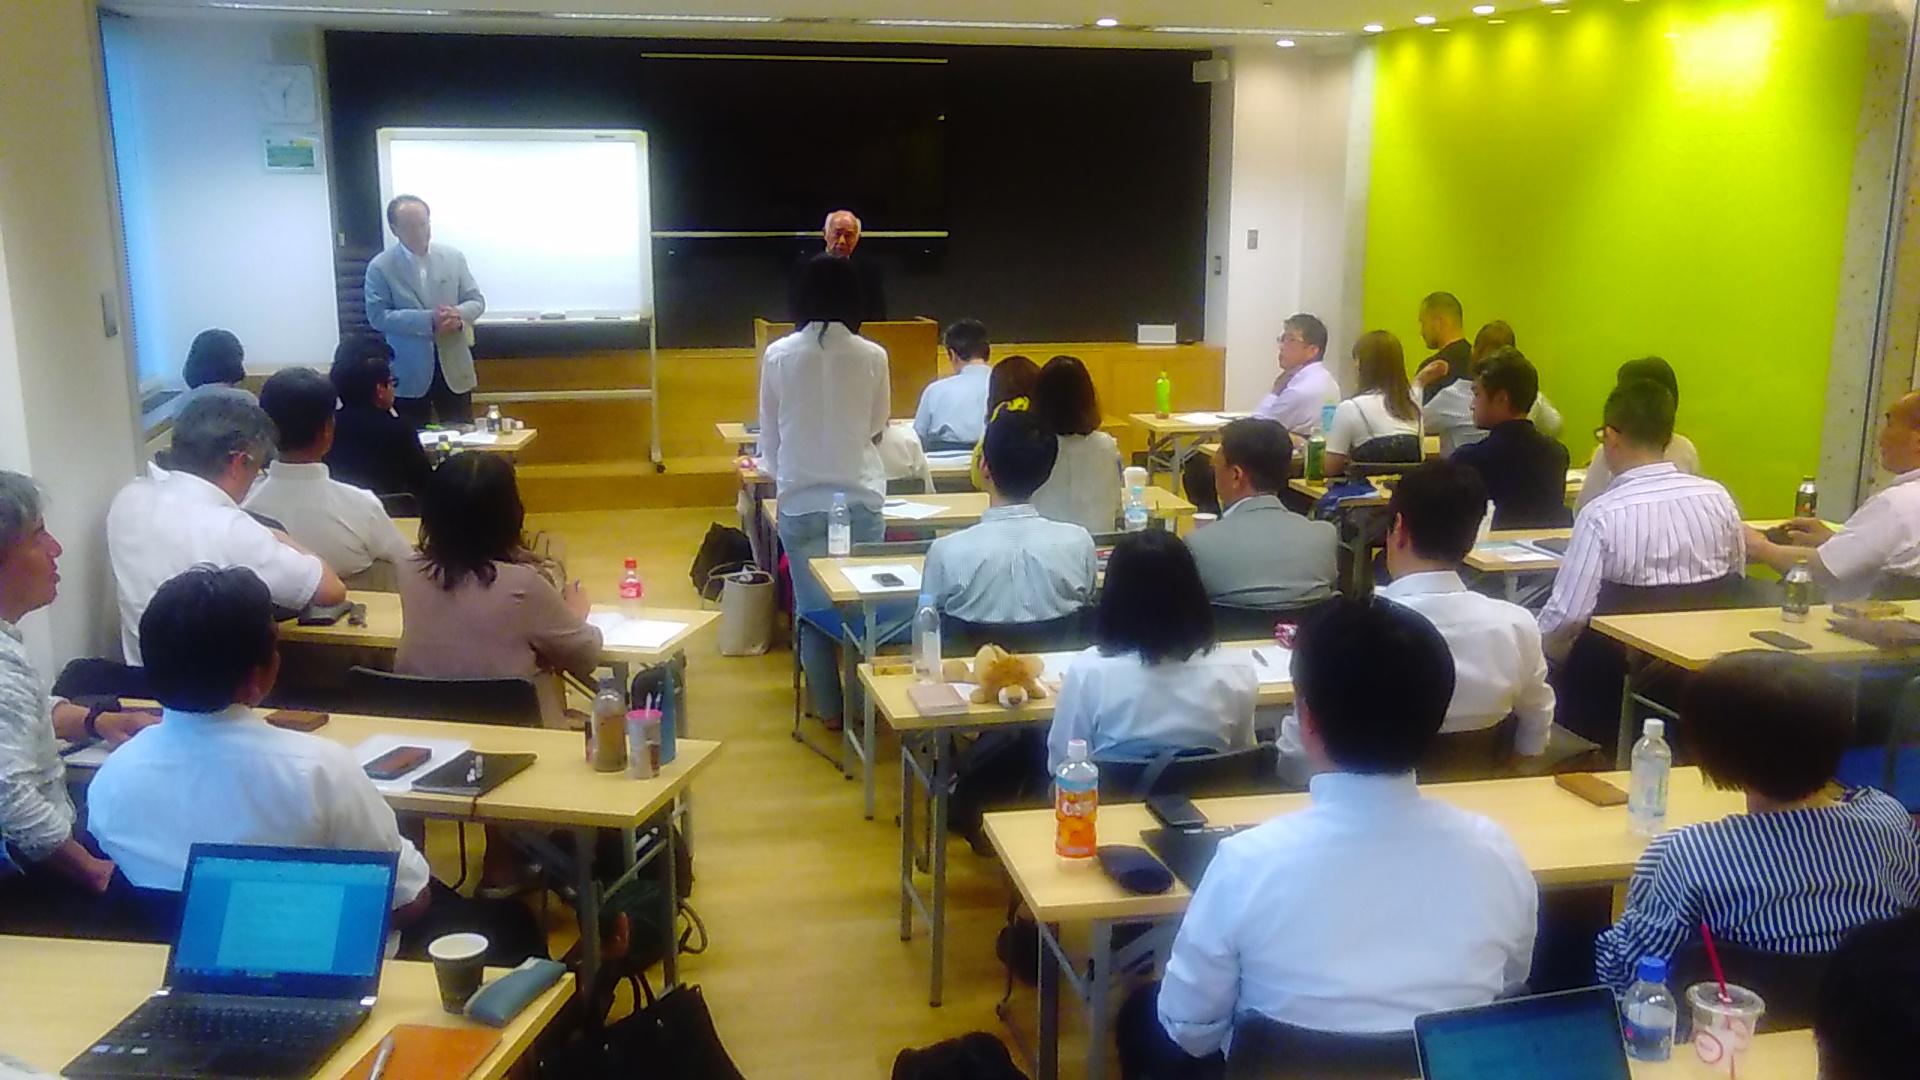 KIMG0761 - 思風会全国大会in広島